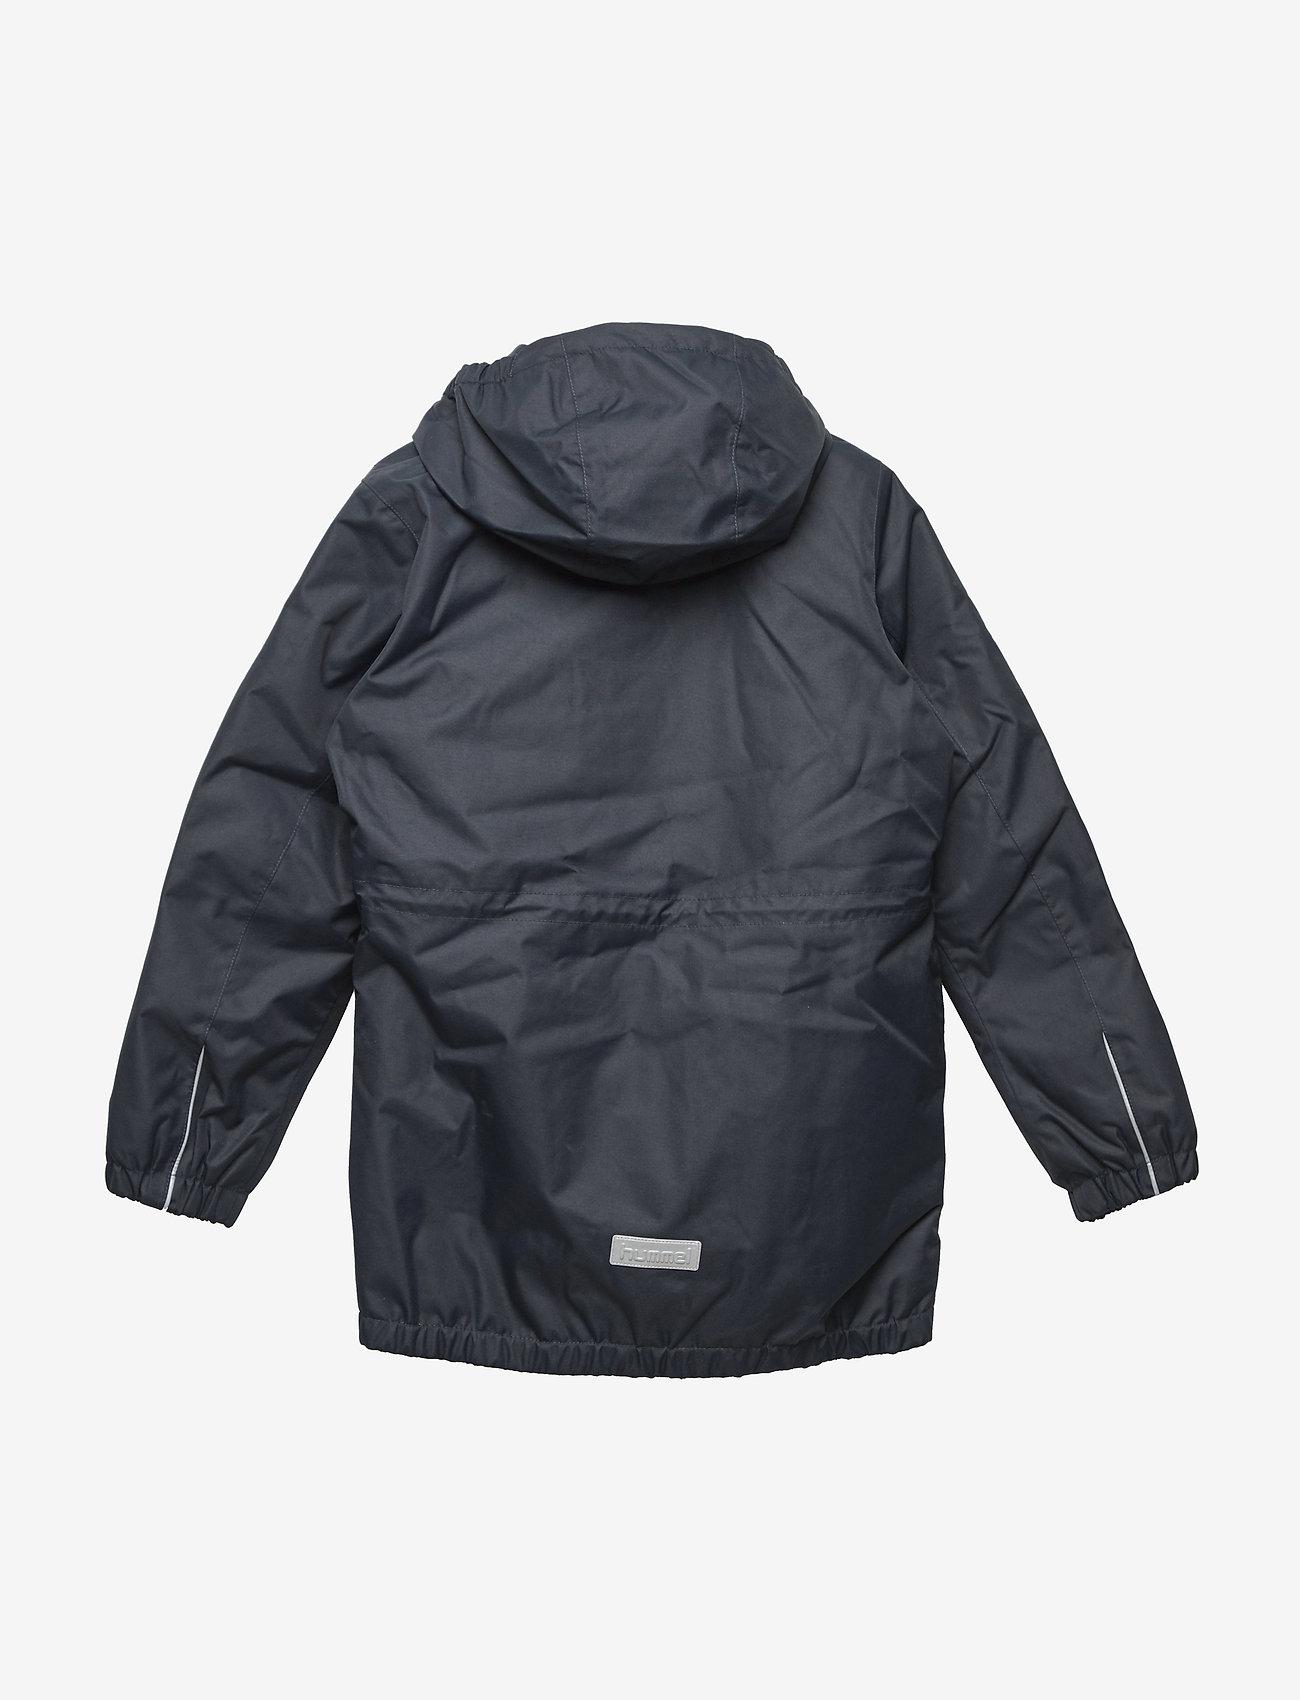 Hummel - HMLDAISY JACKET - insulated jackets - dark navy - 1